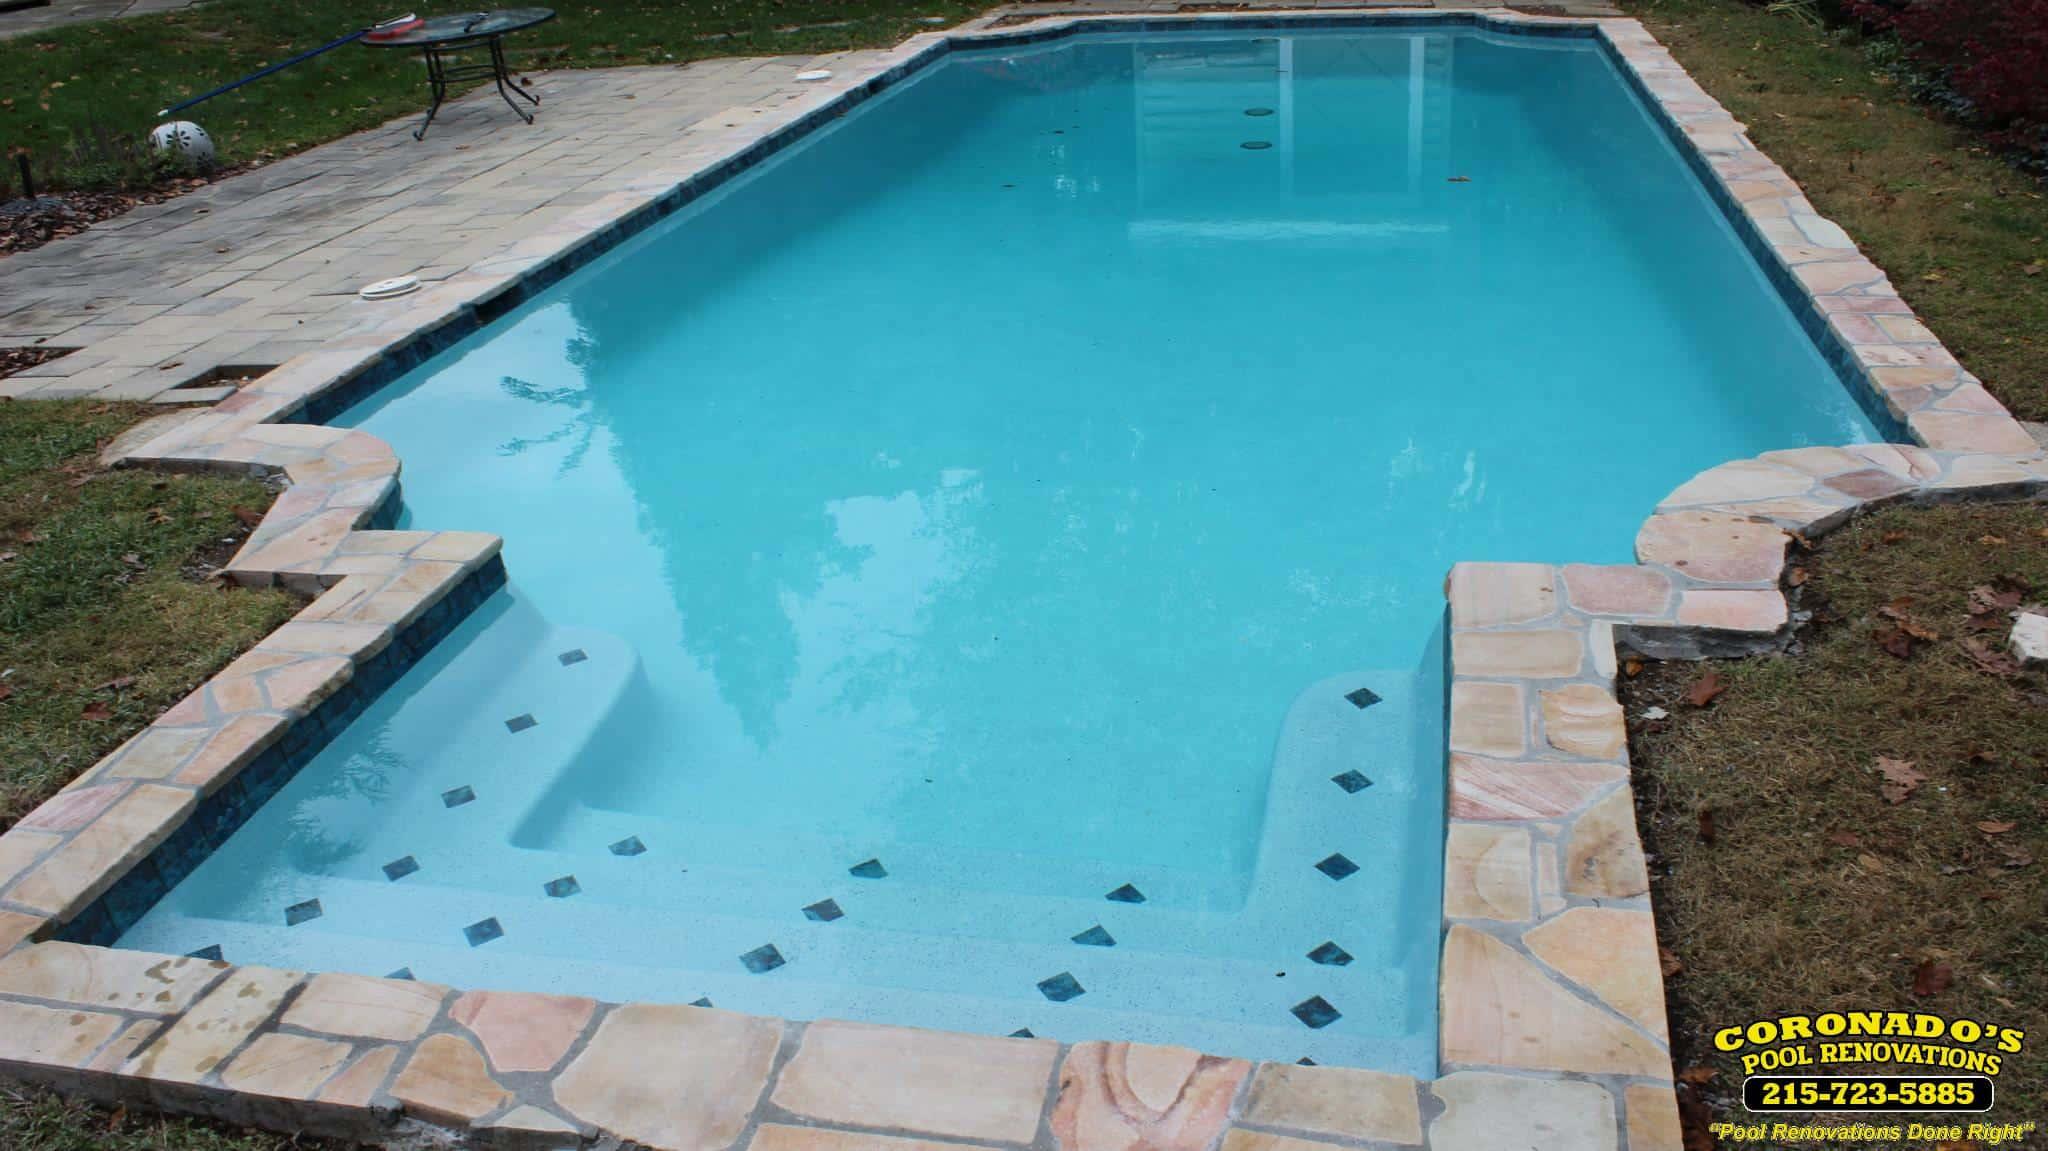 Hydrazzo Pool Plaster Finish Coronado S Pool Renovations